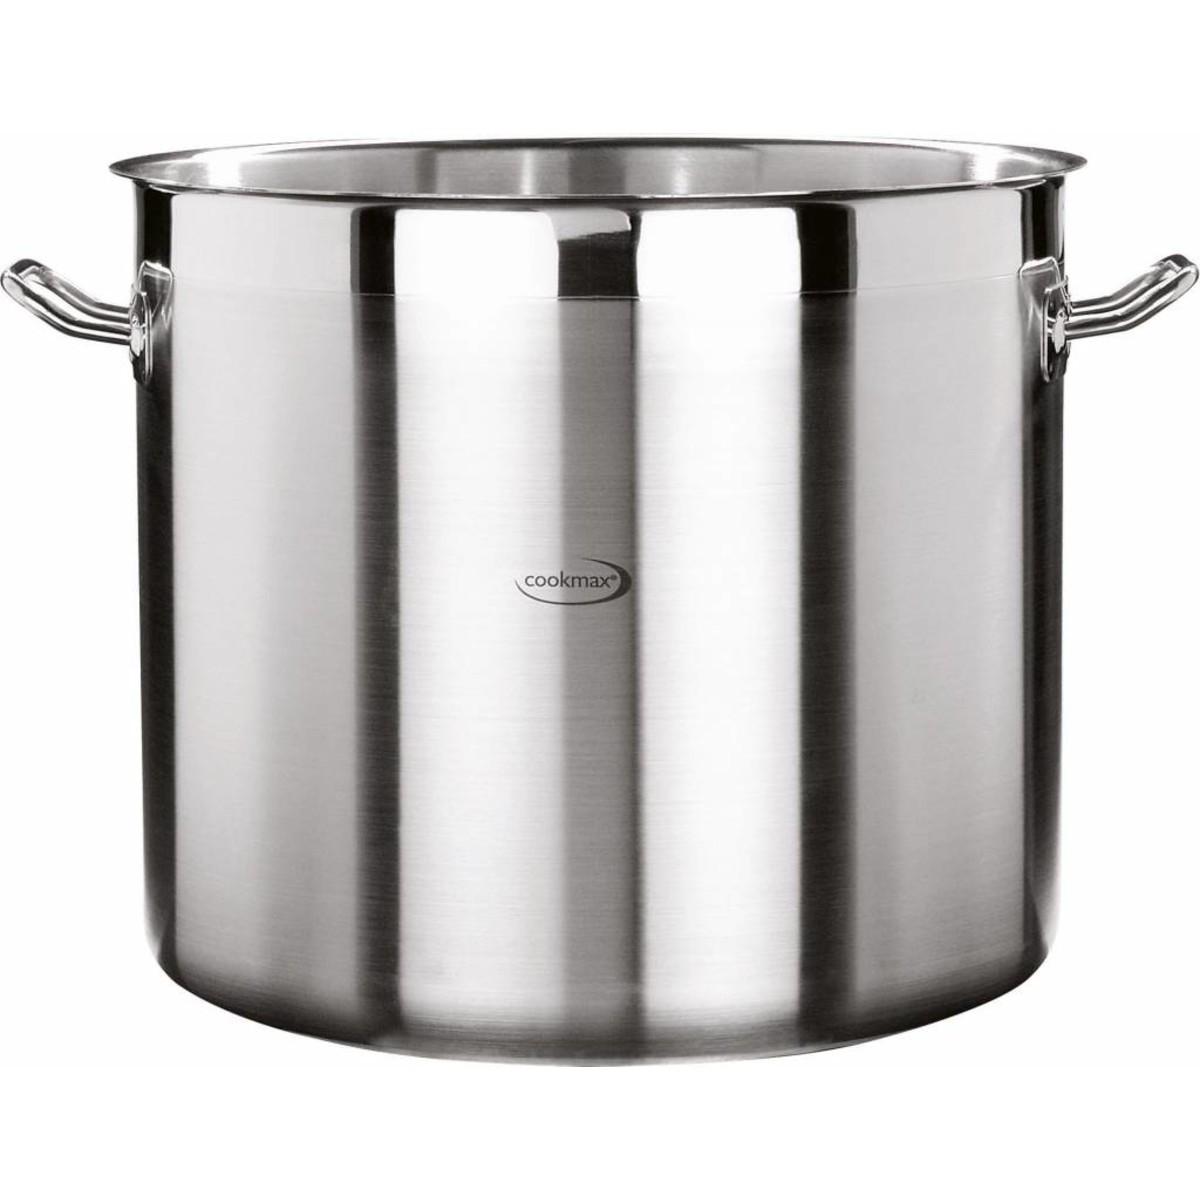 "Gemüse-/Suppenkessel ""Cookmax Professional"" Ø 16 cm, H: 16 cm. Inhalt 3,2L"